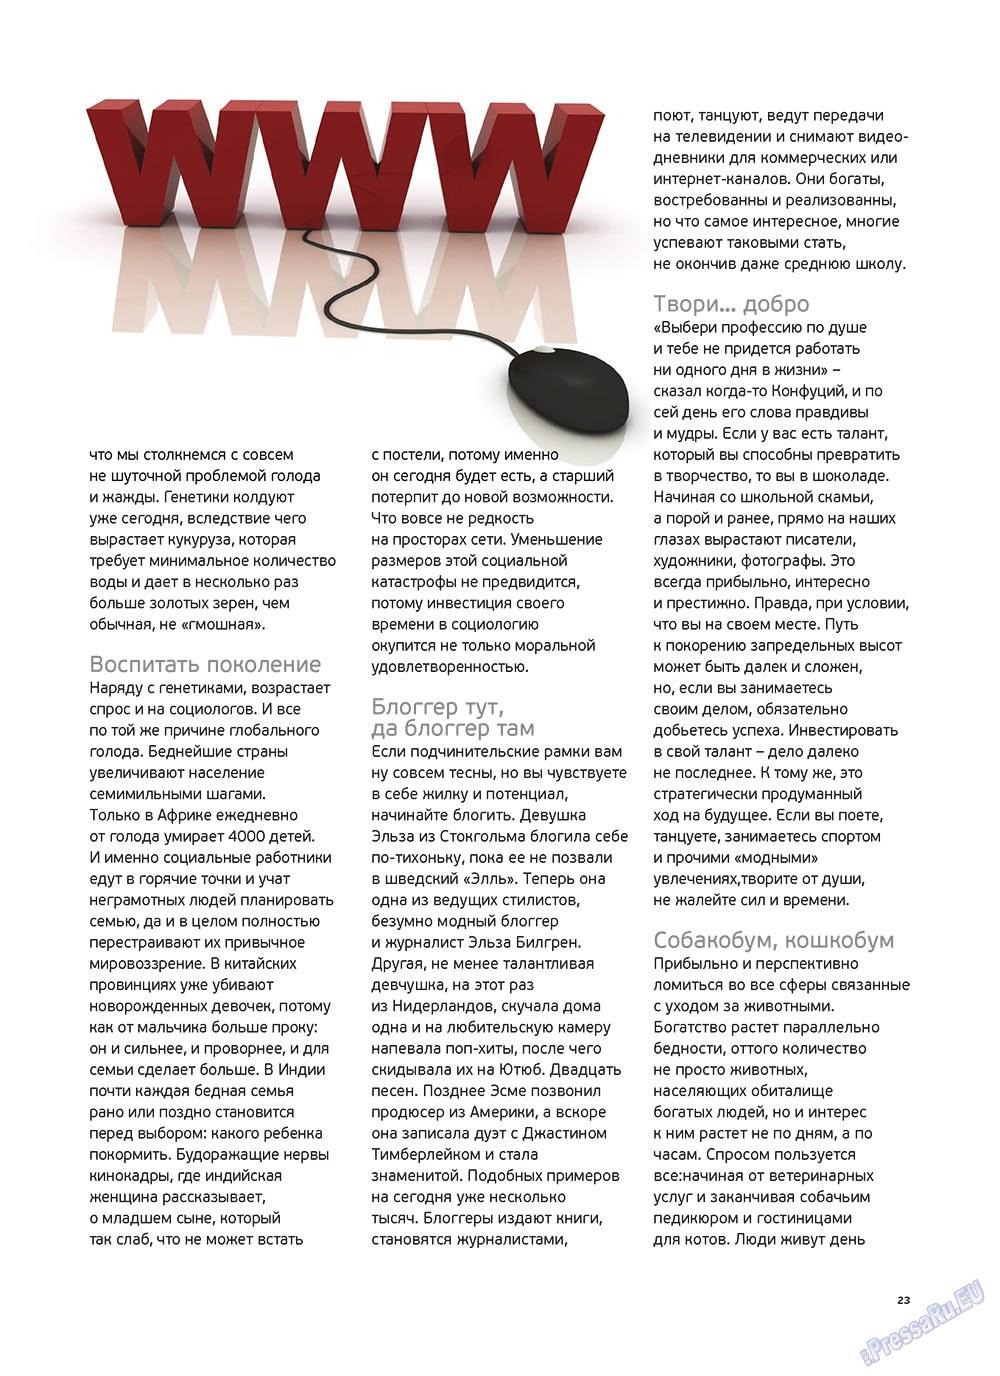 Артек (журнал). 2011 год, номер 3, стр. 25